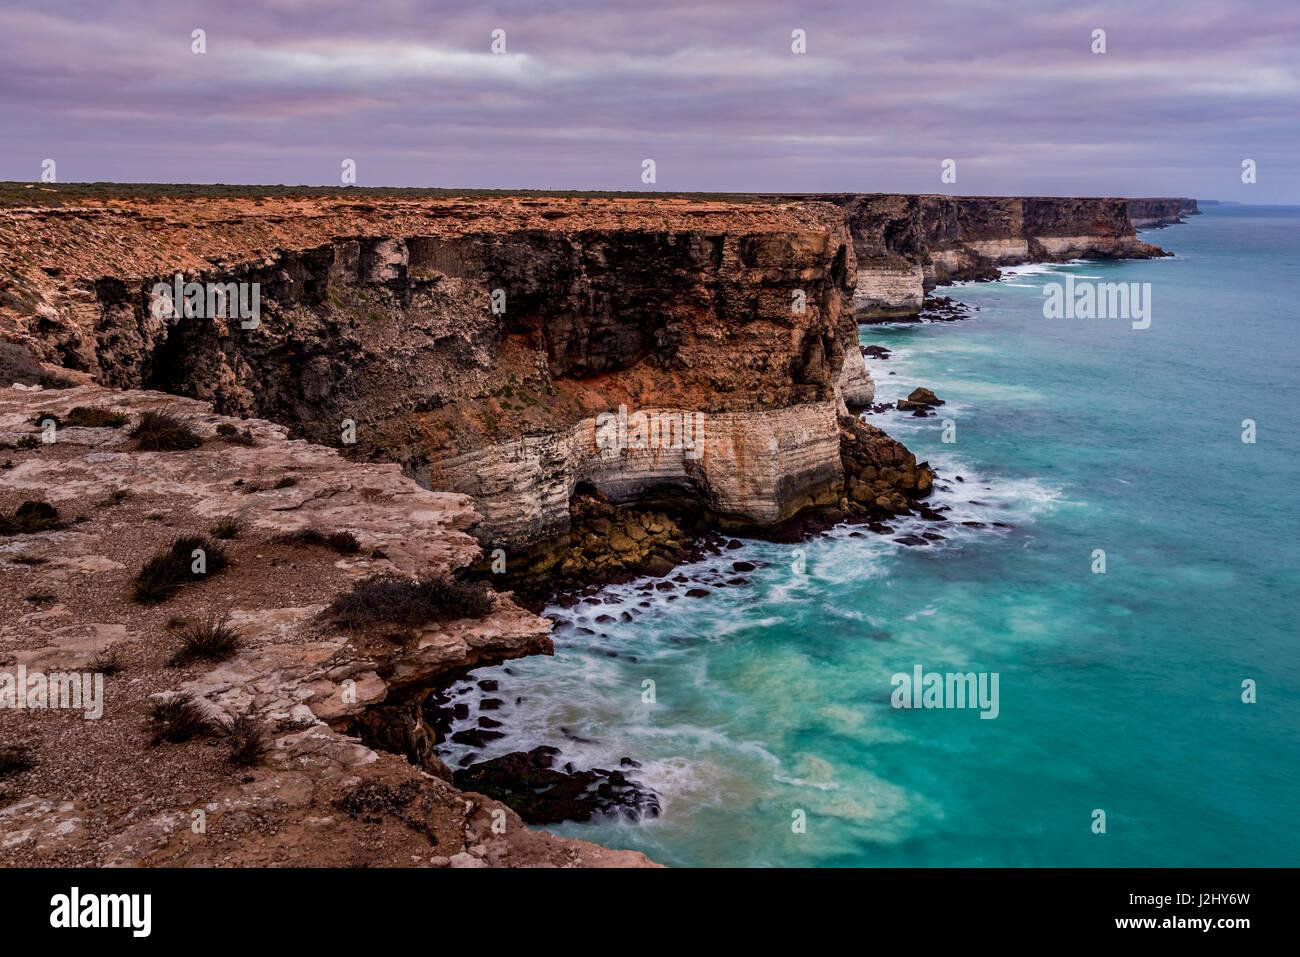 90m tall and 100km long Bunda Cliffs in Siuth Australia - Stock Image